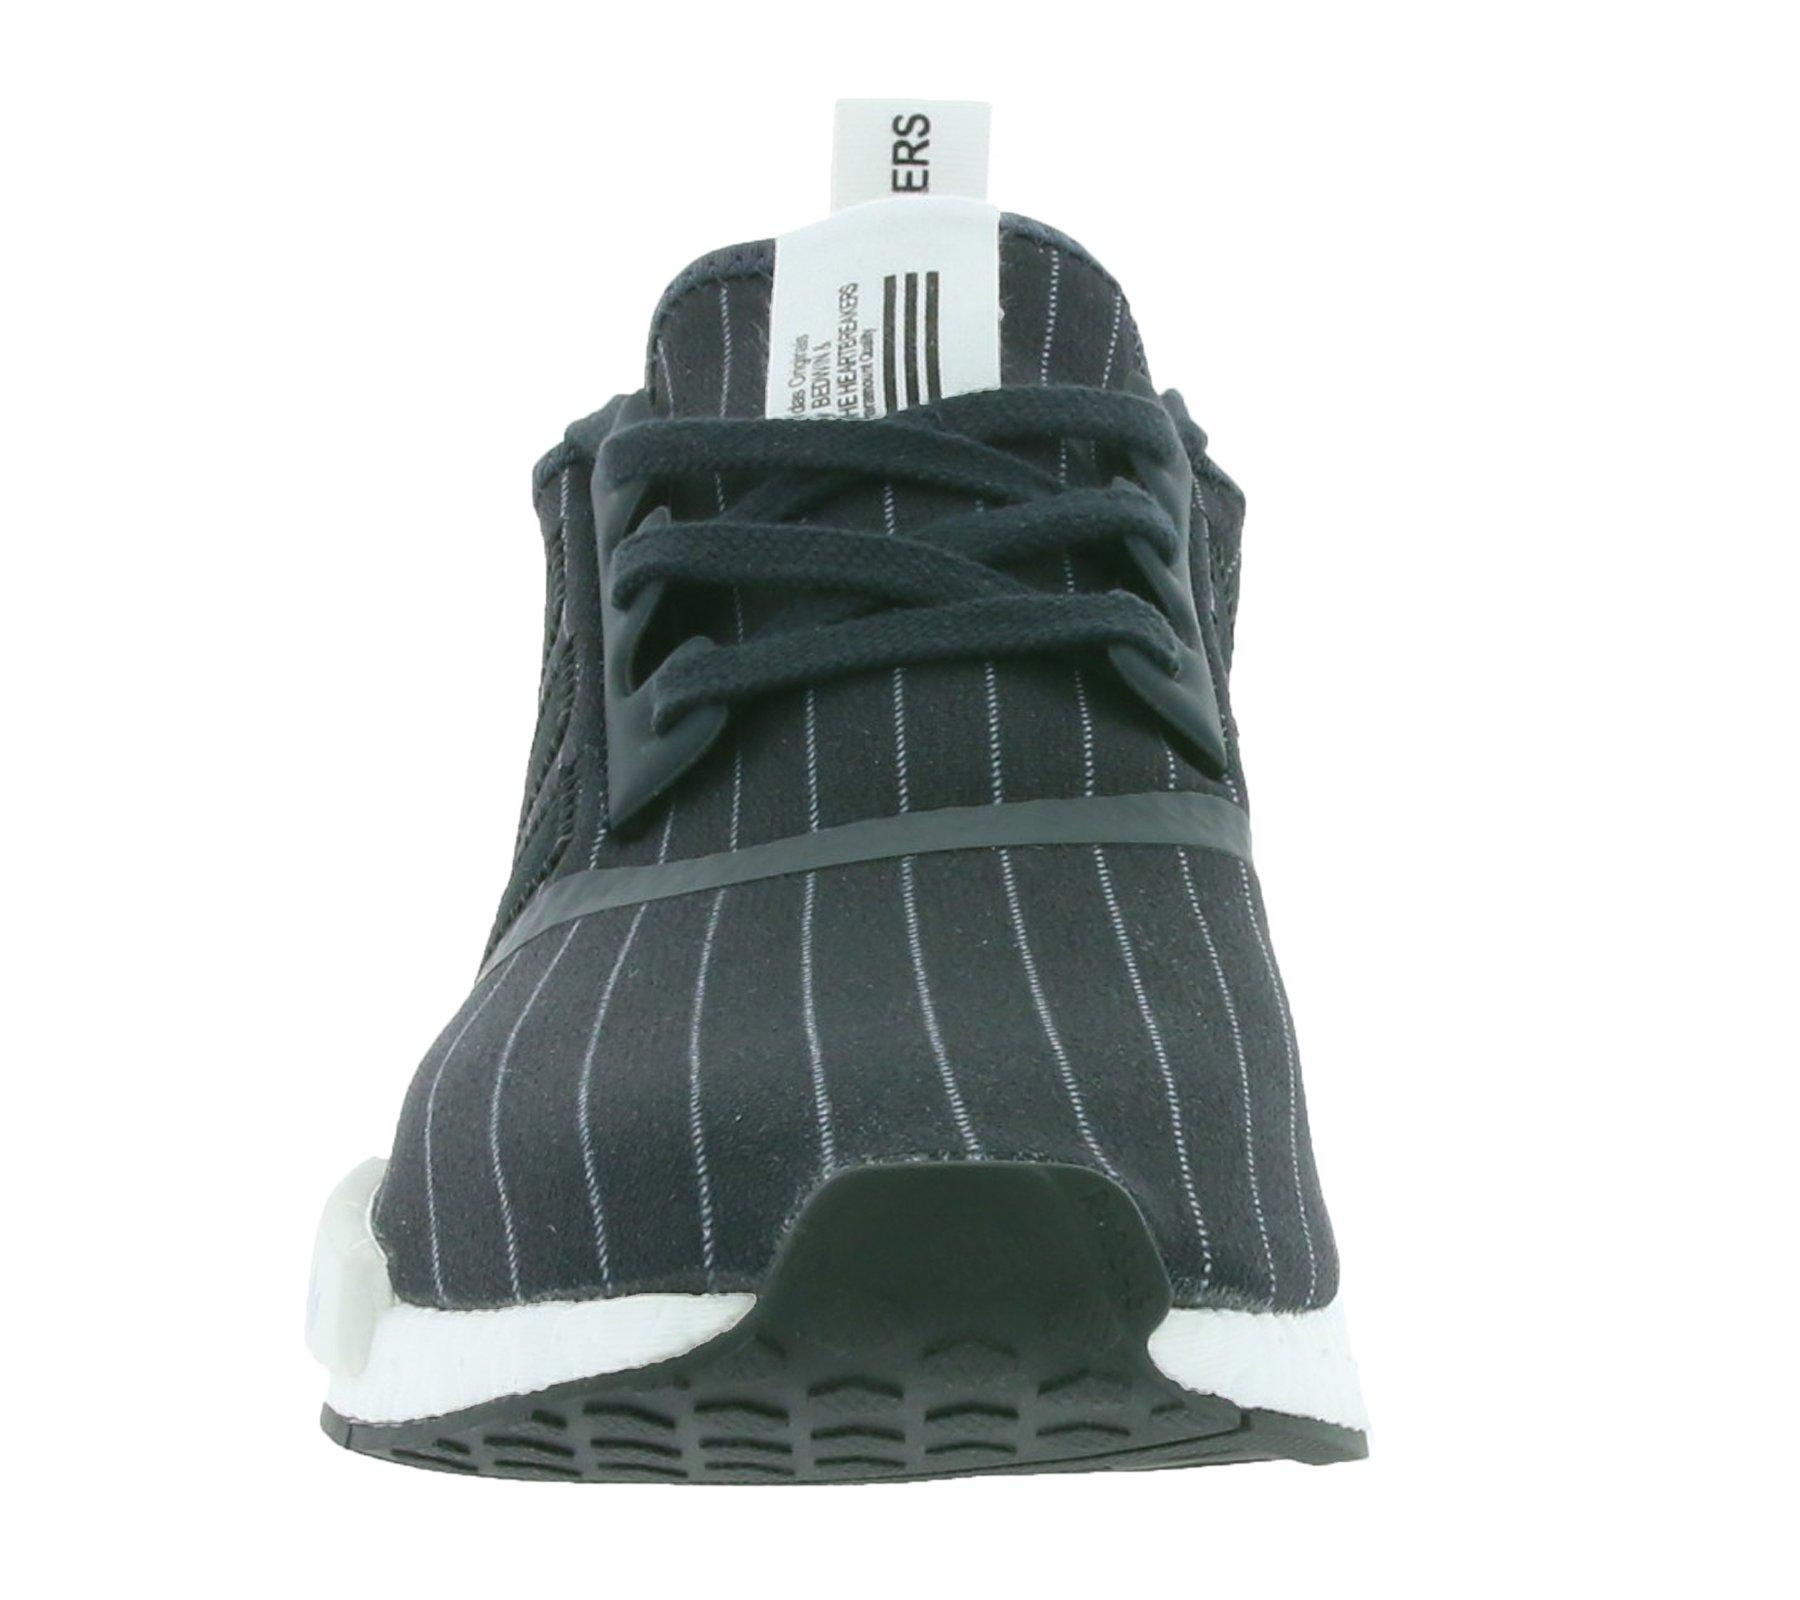 Bb3124 r1 Originals I Nmd Size Bedwin Nero Formatori 42 Adidas q6pHBx